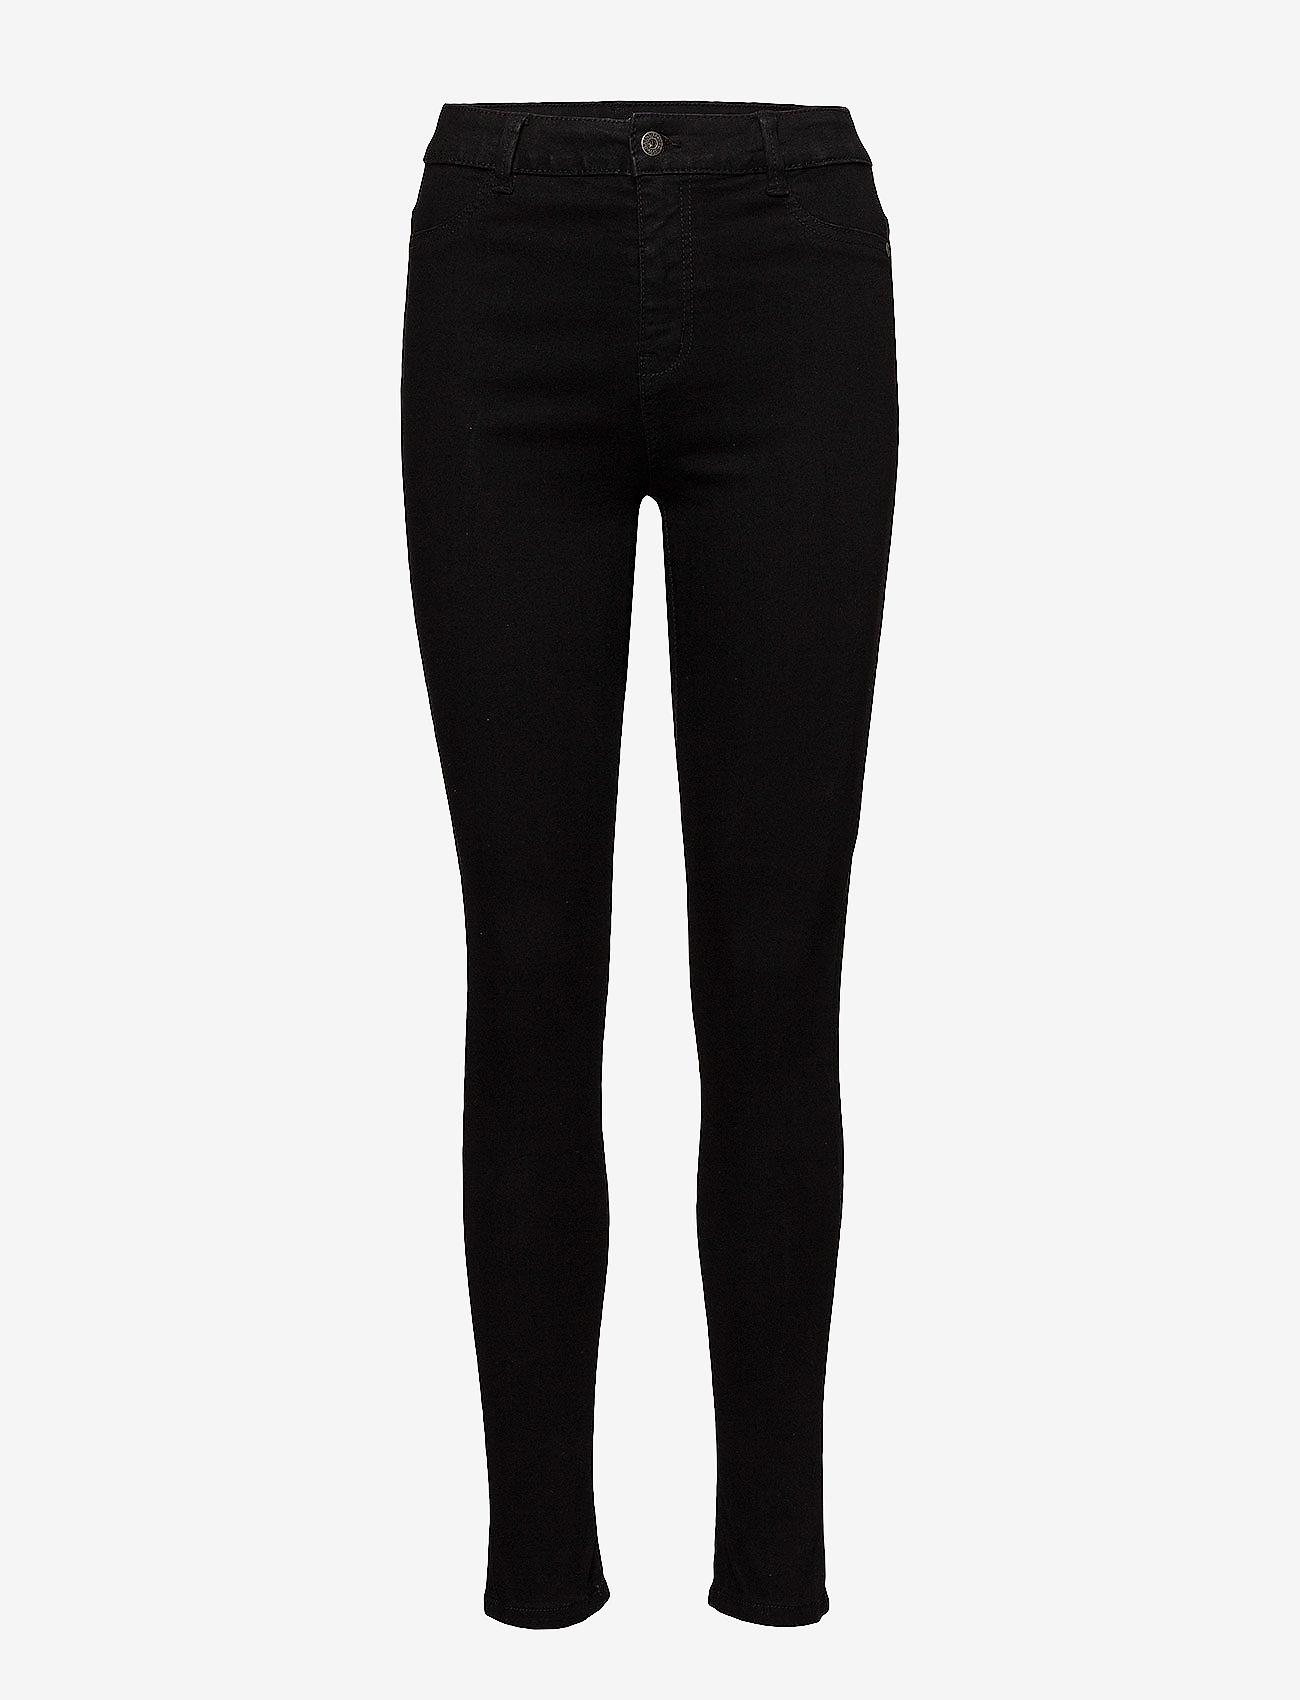 Saint Tropez - T5757, UllaSZ Jeans - skinny jeans - black - 1